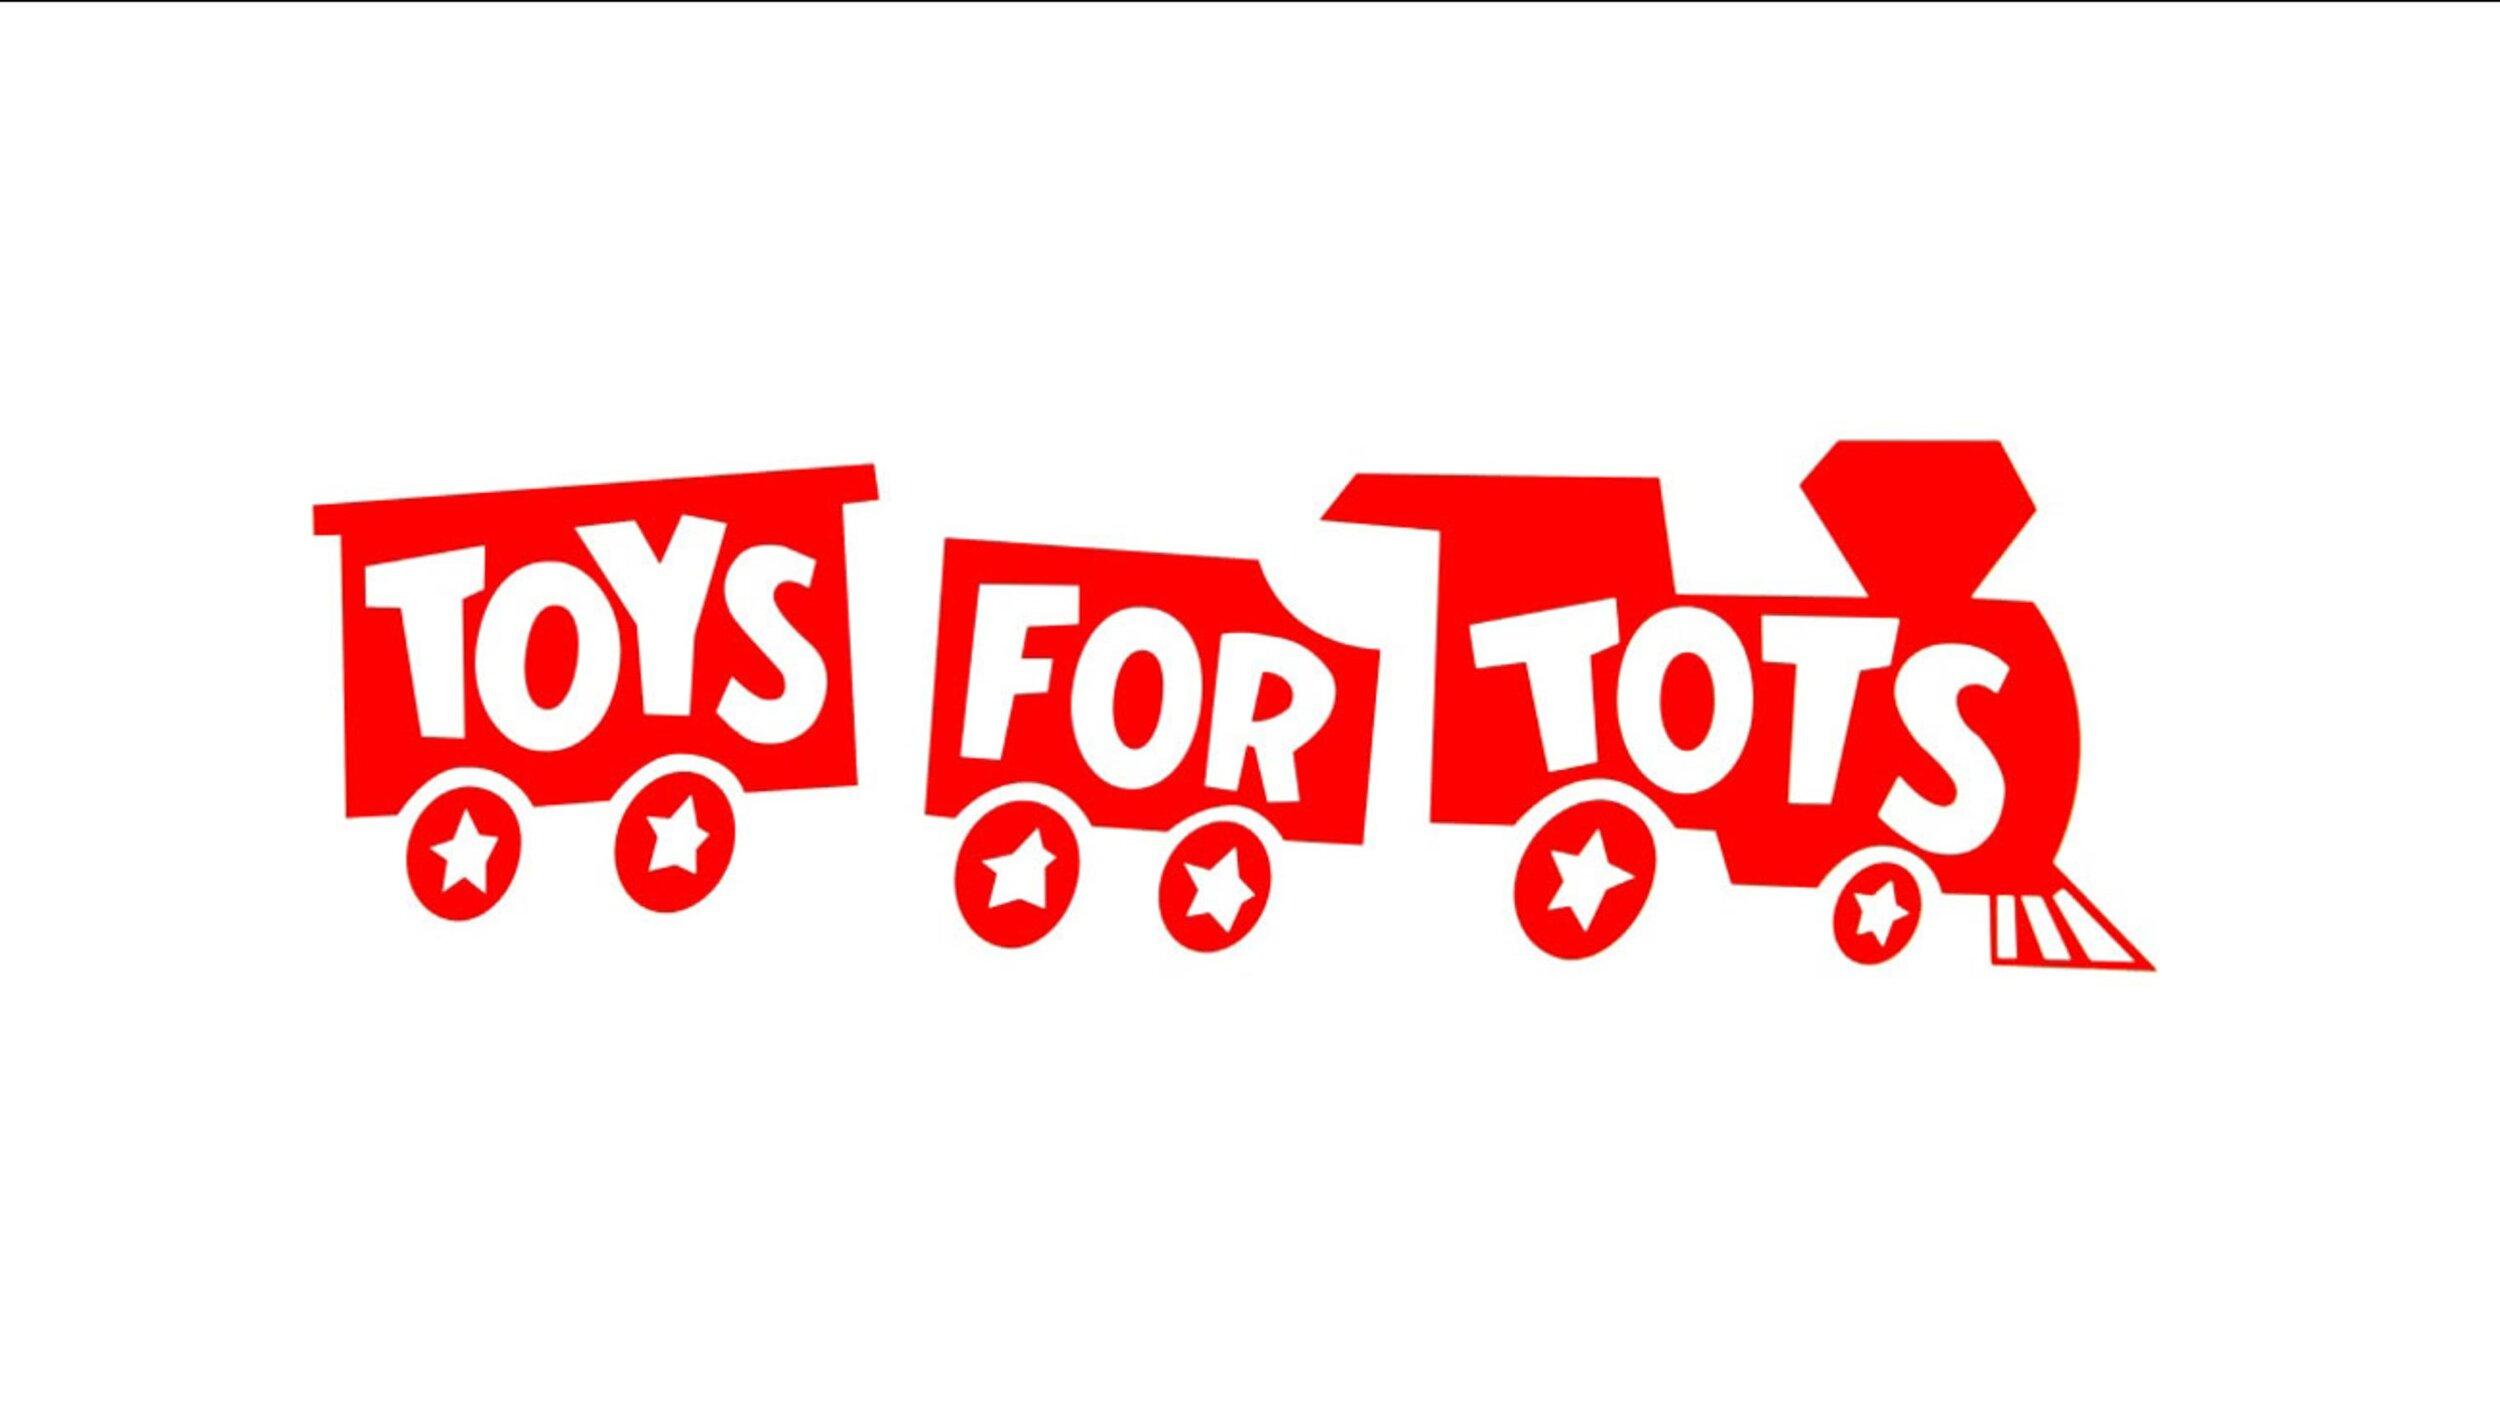 6b1e800c-e82b-4305-81c0-84860f667e9e-Toys_for_Tots_Logo.jpg